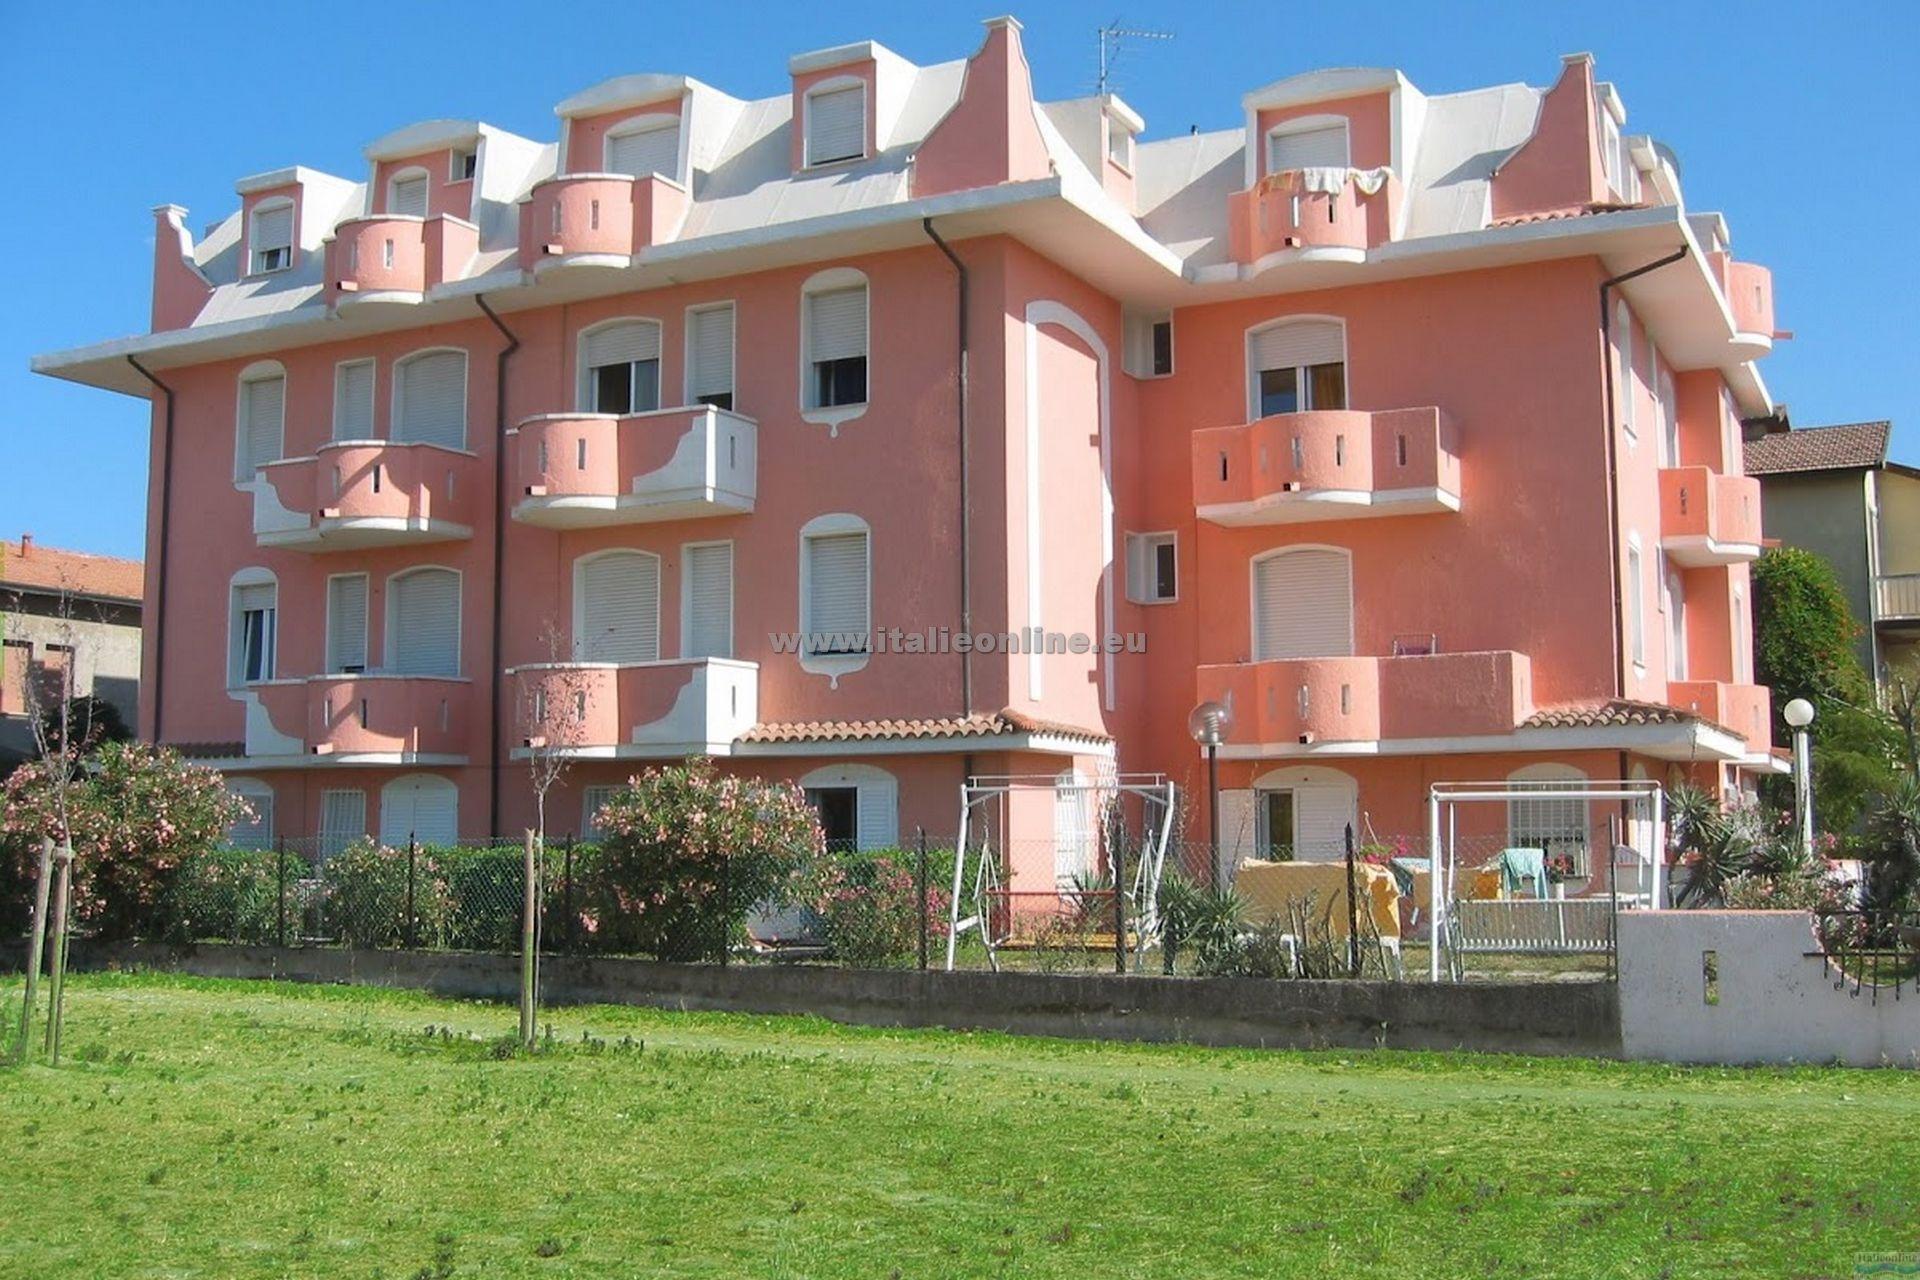 Residence Doria II Porto Garibaldi Italia Italieonline